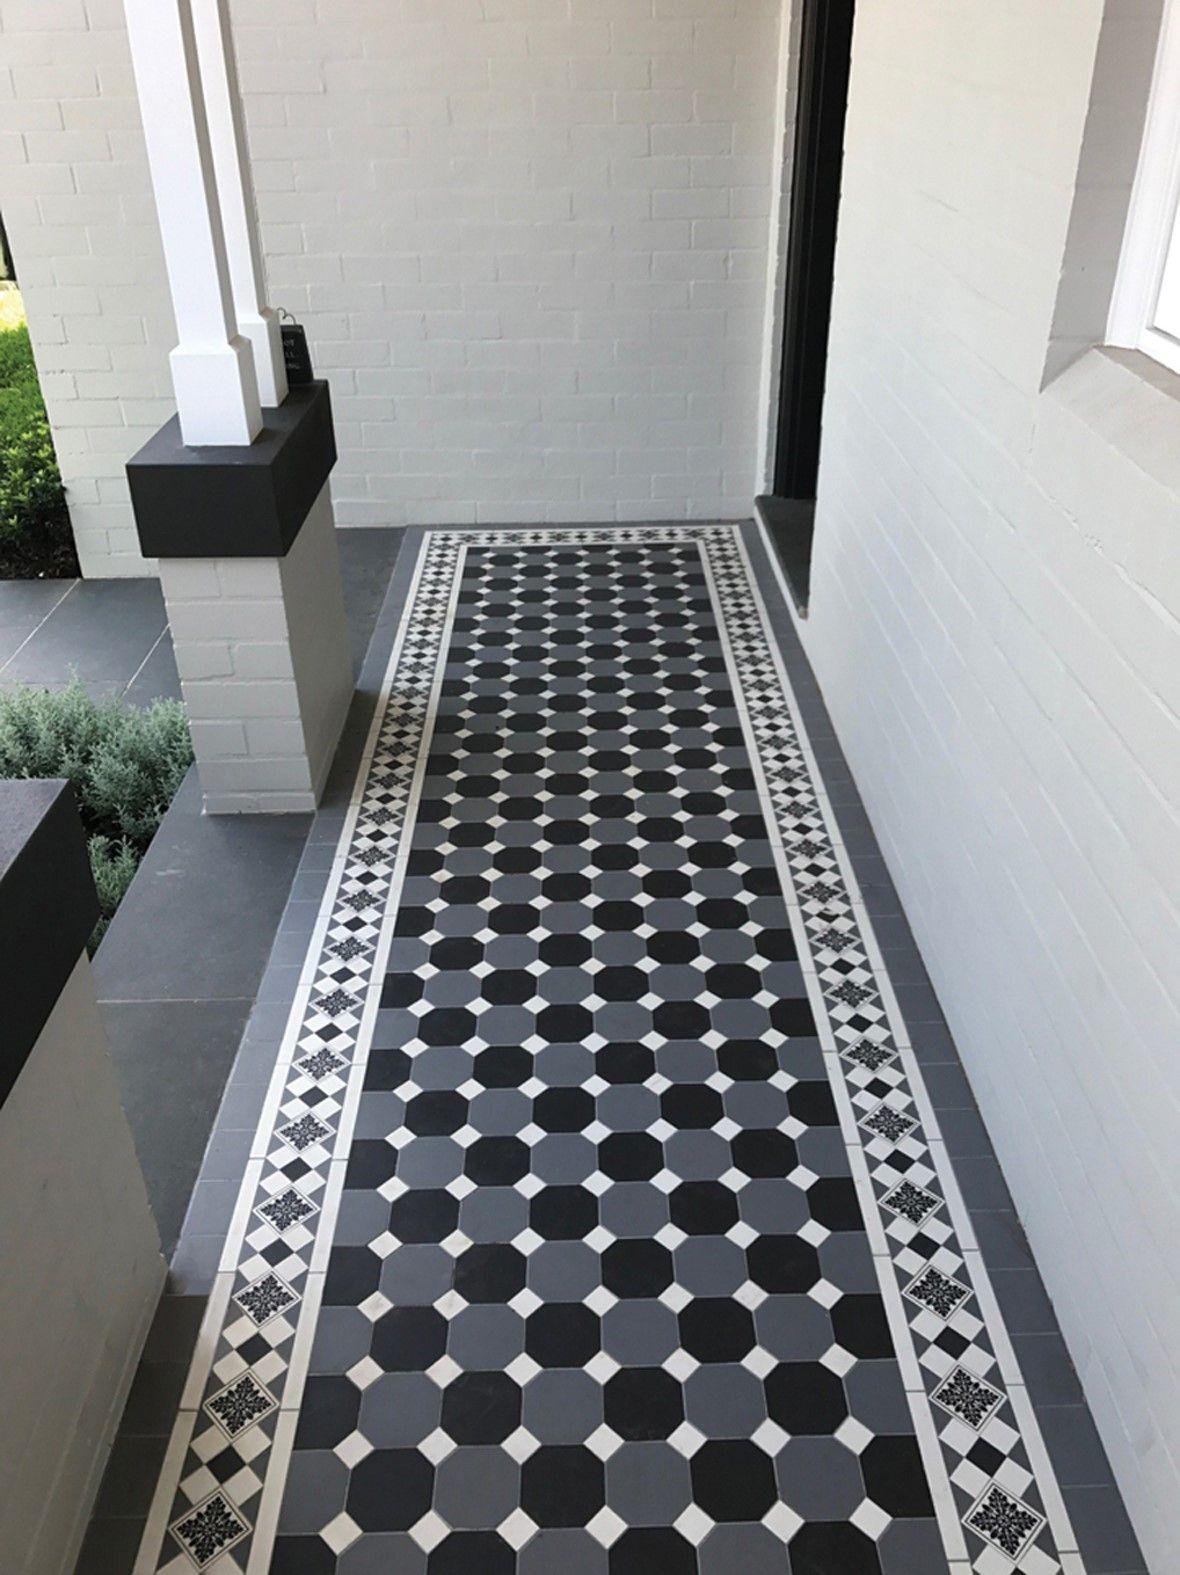 Oxley Checkerboard Pattern Dark Grey Octagon Carbon Black Octagon Grand Norwood Border Infill Minimalist Bedroom Decor Tiles Checkerboard Pattern